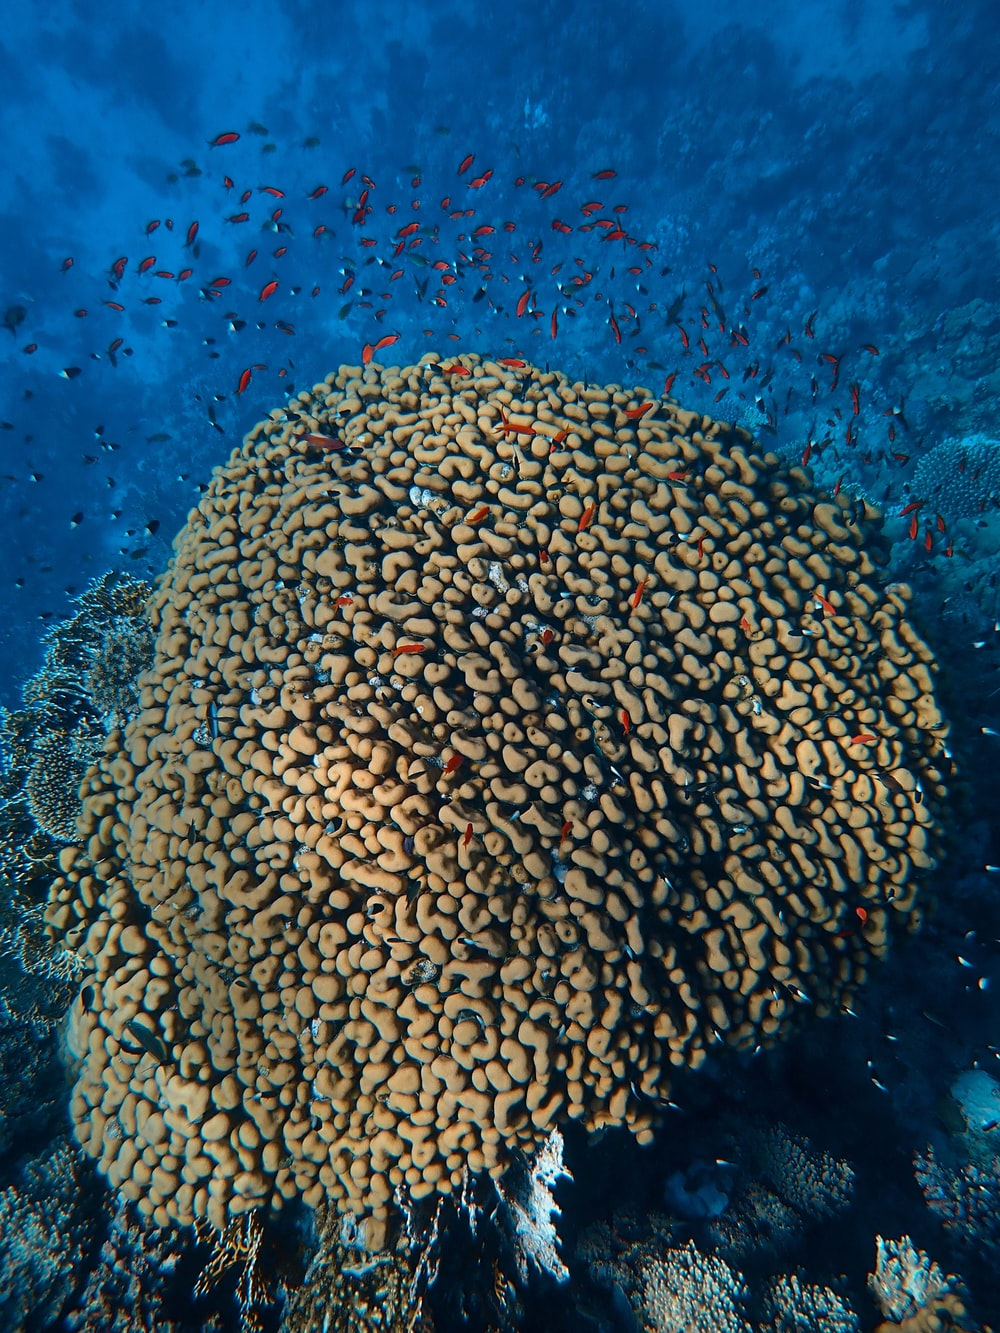 brown coral reef in water